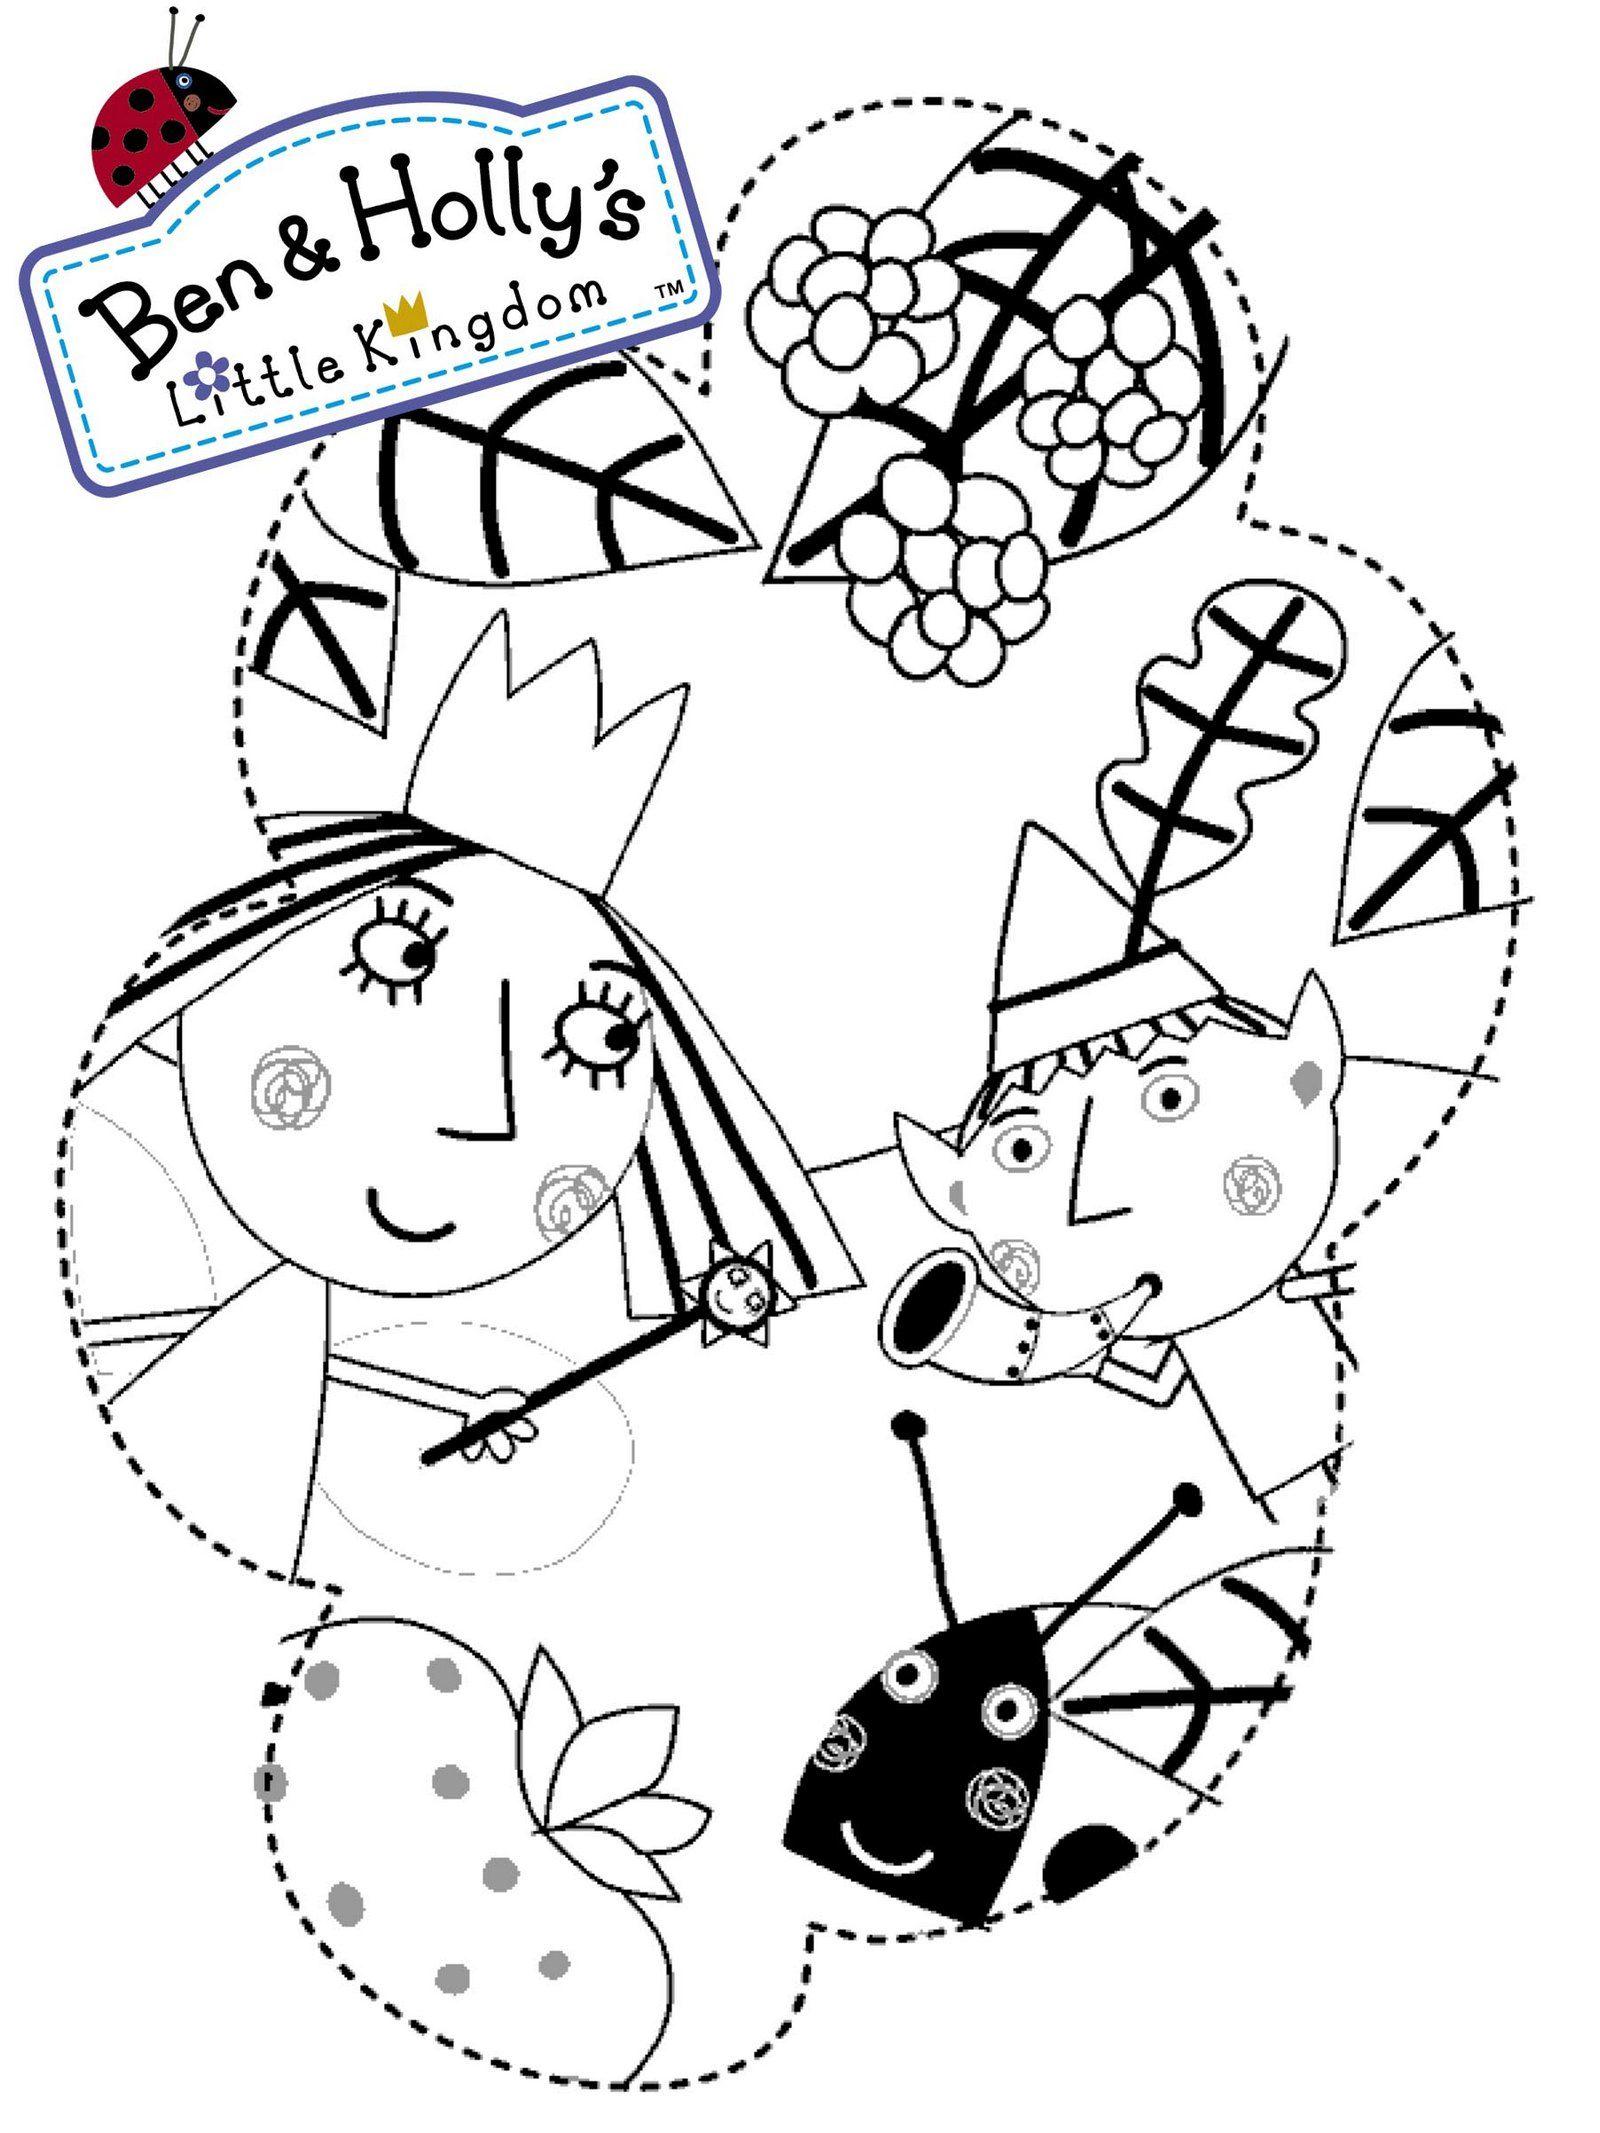 Ben Elf And Princess Holly Coloring Page Ben And Holly Coloring For Kids Ben Elf